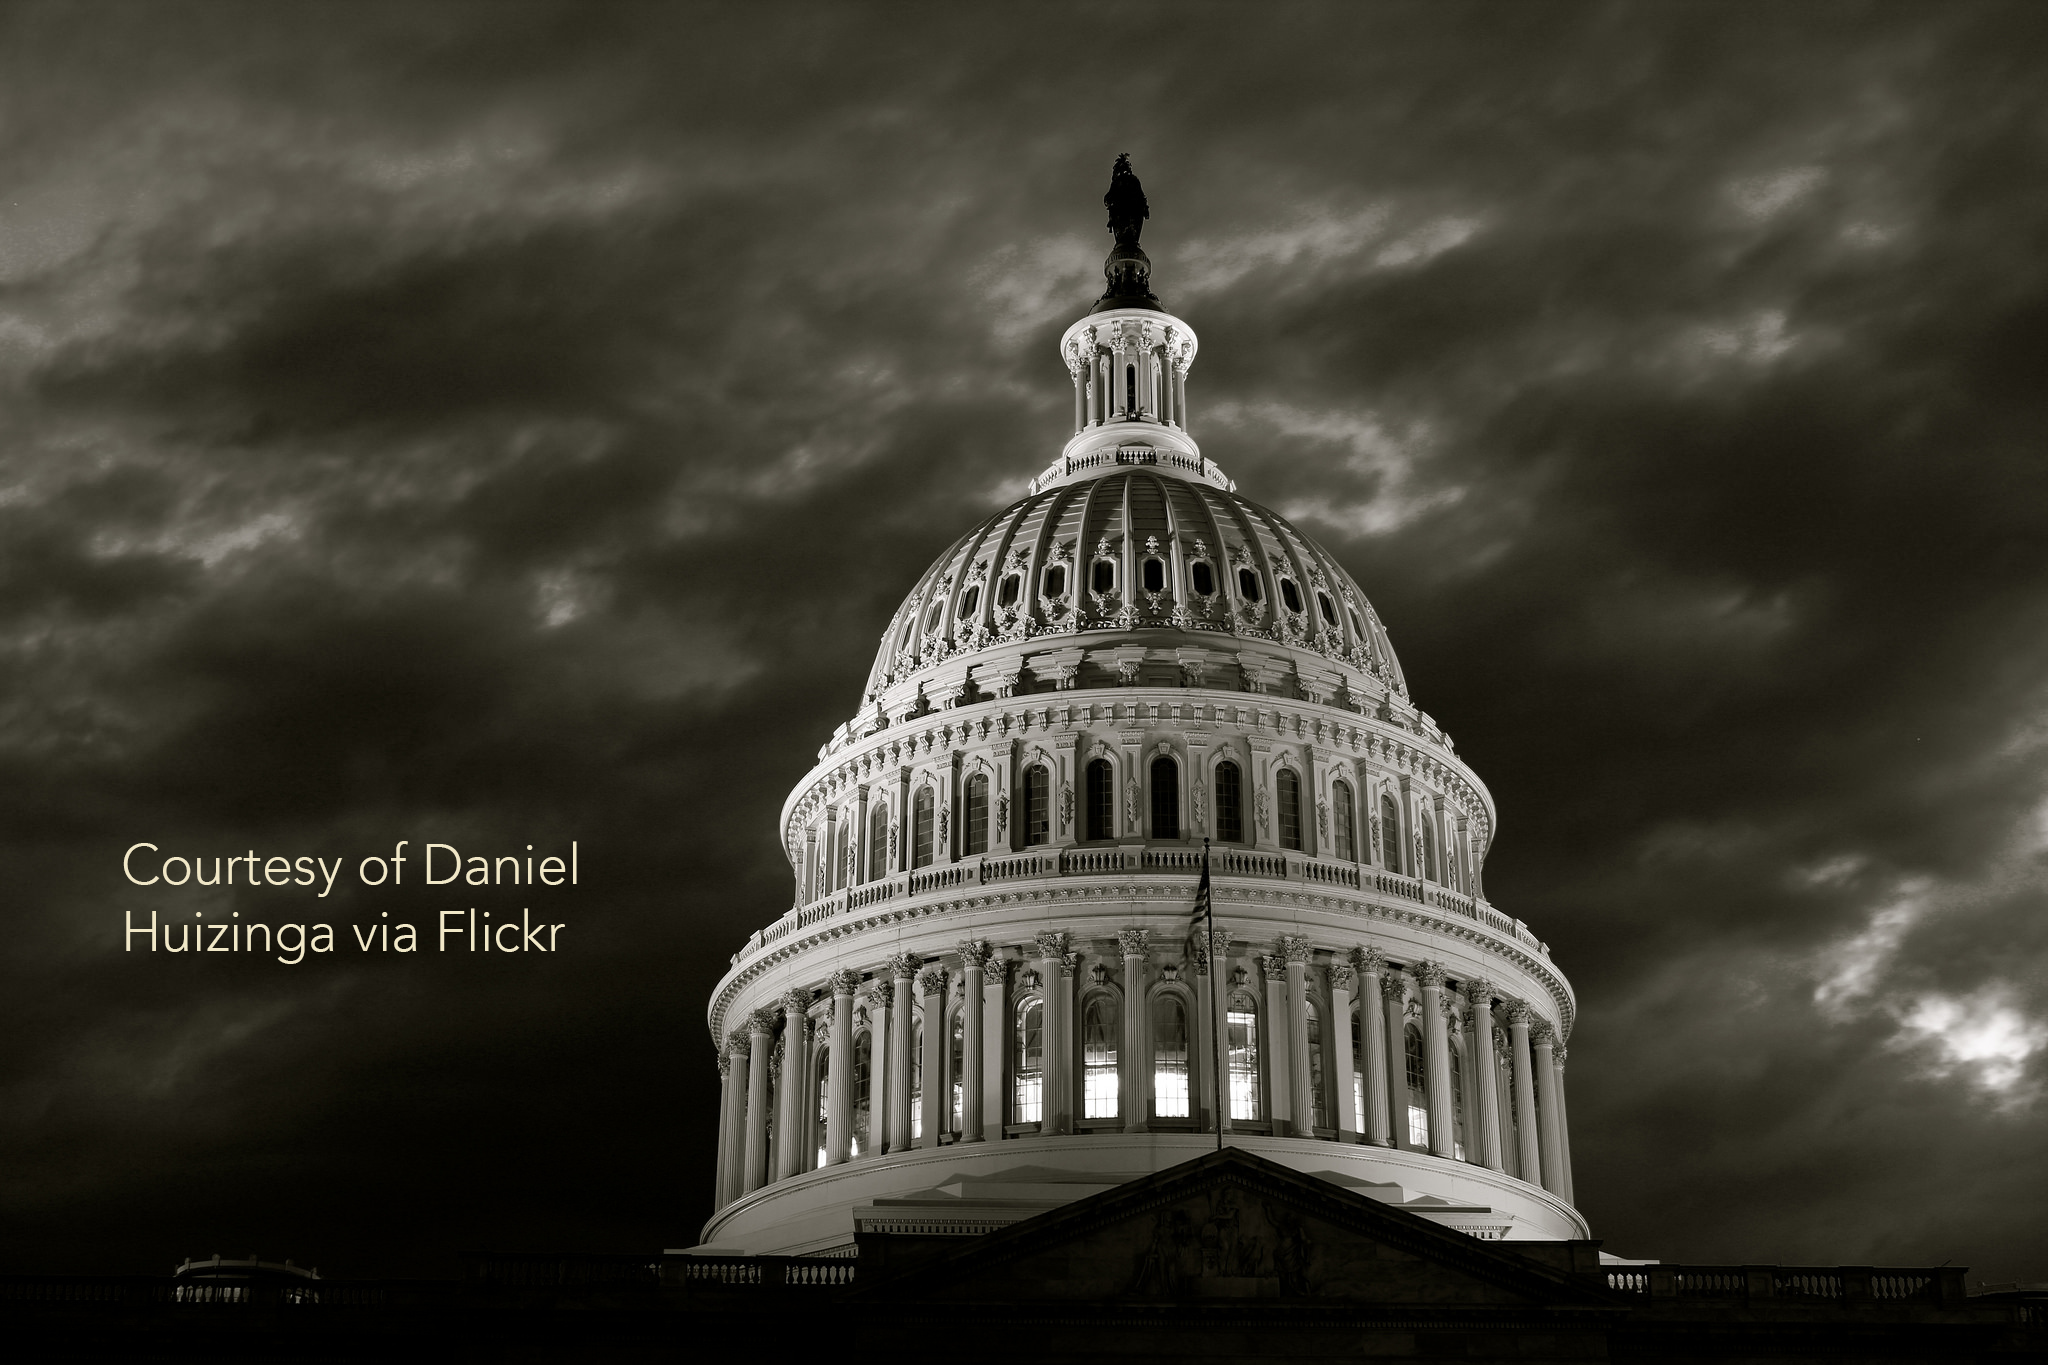 A dark portrayal of the capitol in washington D.C.